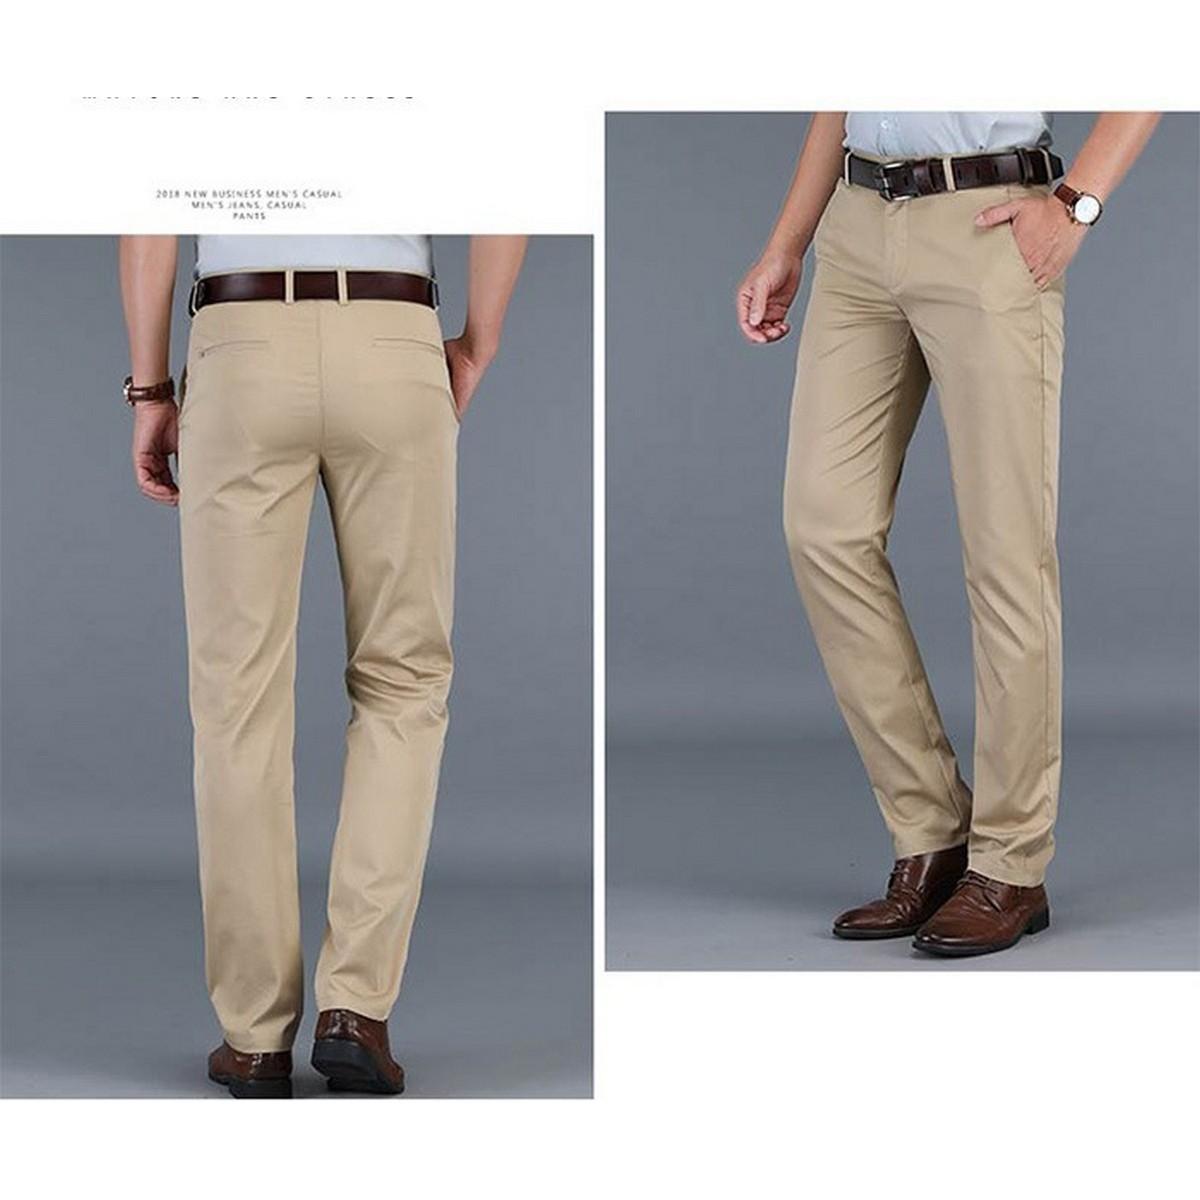 New Men's Basic Skin Color COTTON JEANS Business Pants  Regular Straight Pocket Stretch Pants Trending Fashion